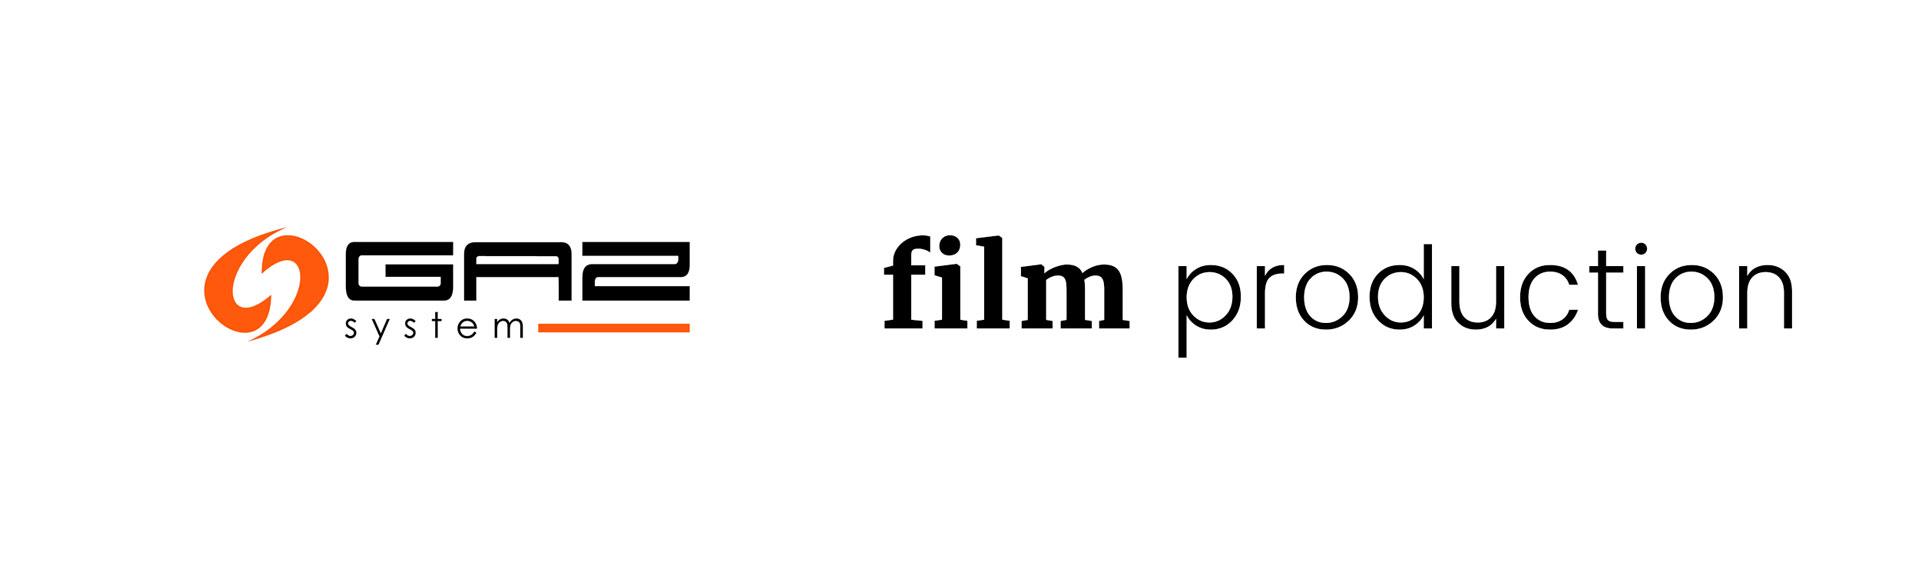 gaz_system_film